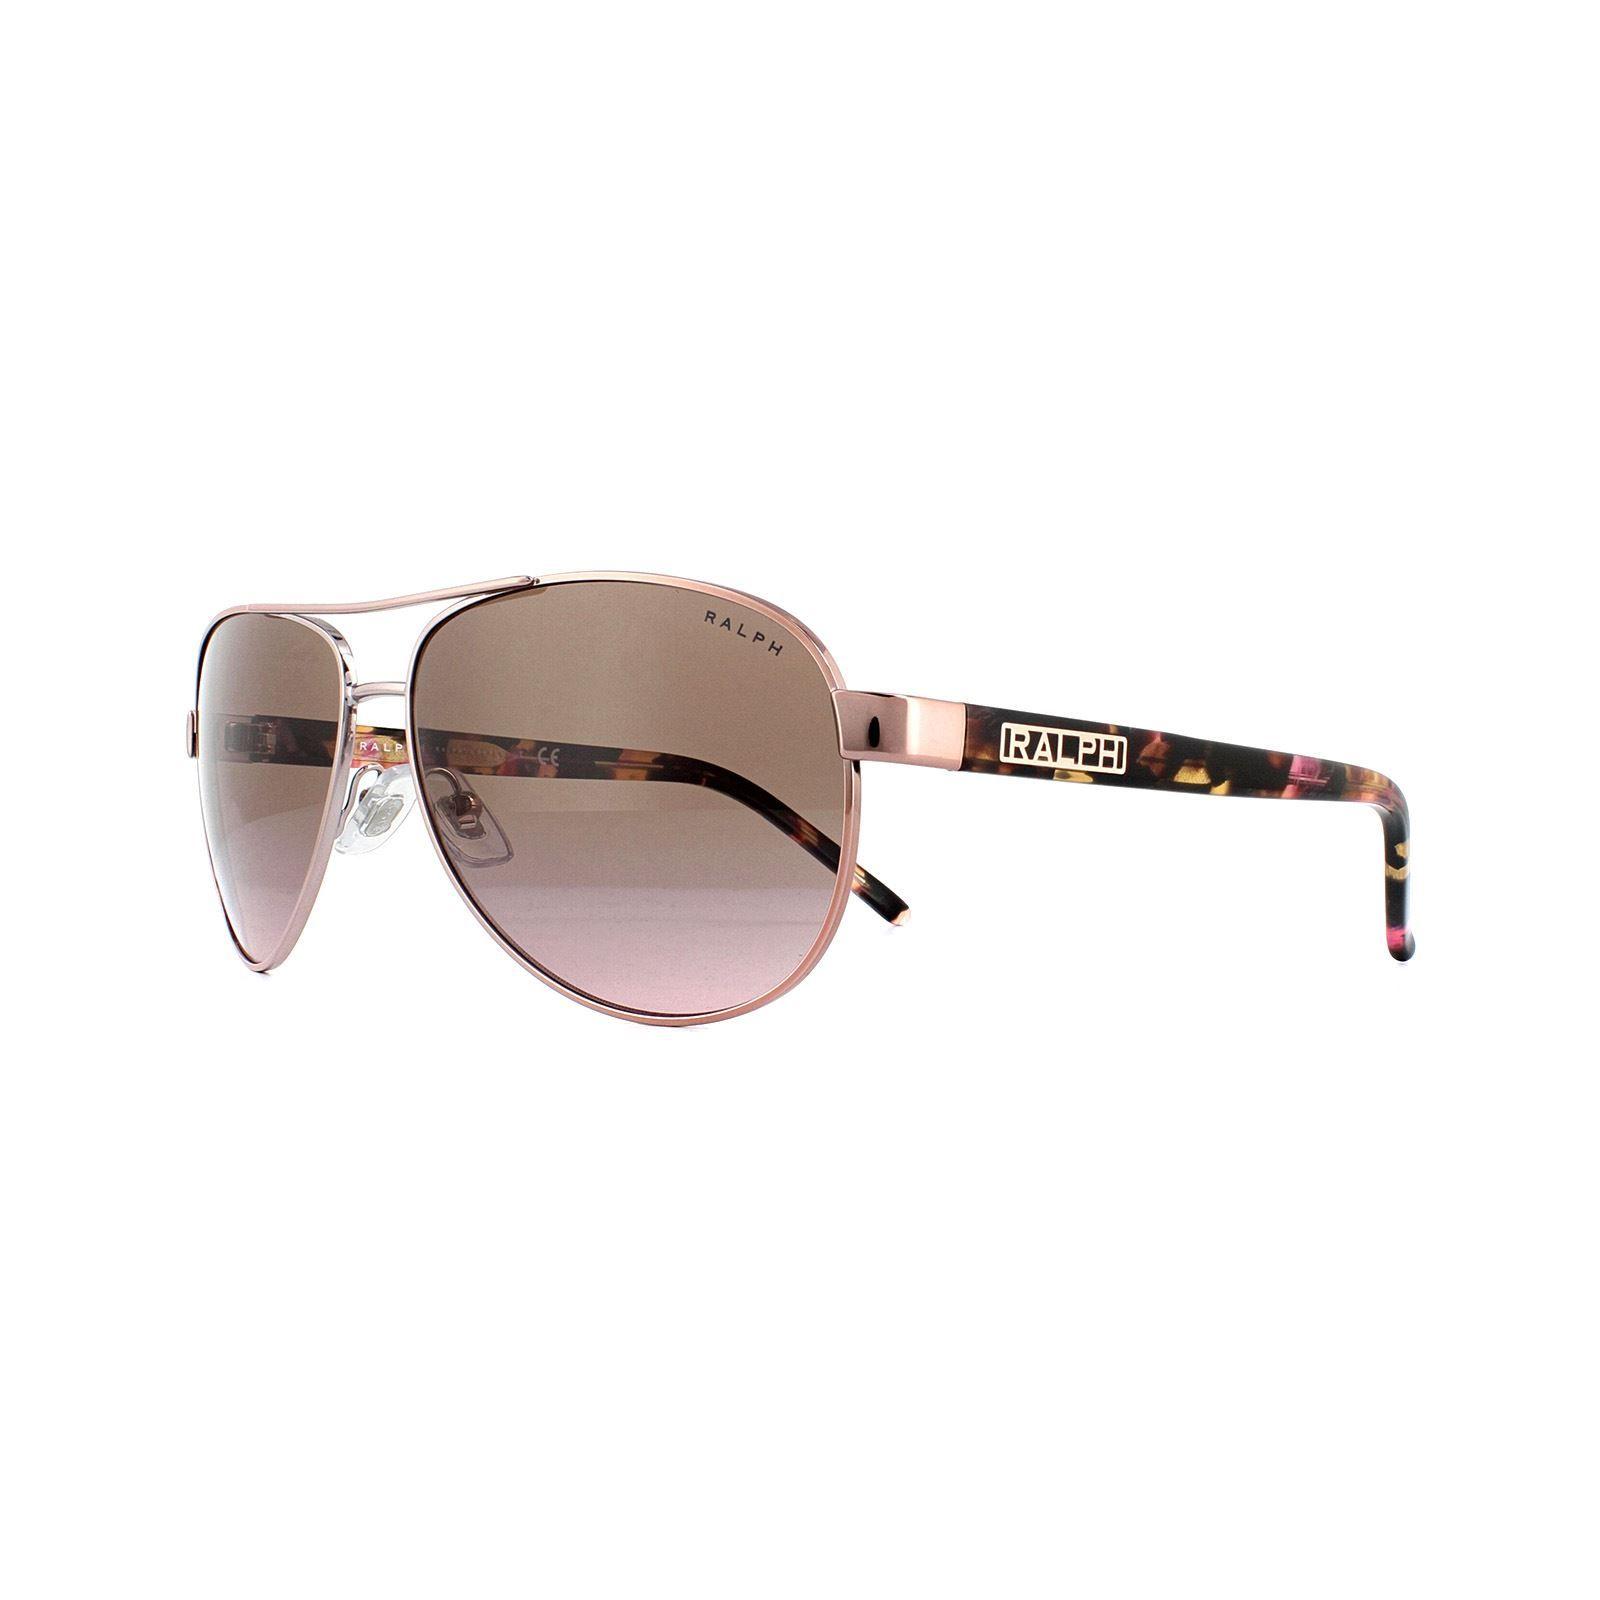 Ralph by Ralph Lauren Sunglasses 4004 915814 Rose Gold Violet Gradient Brown